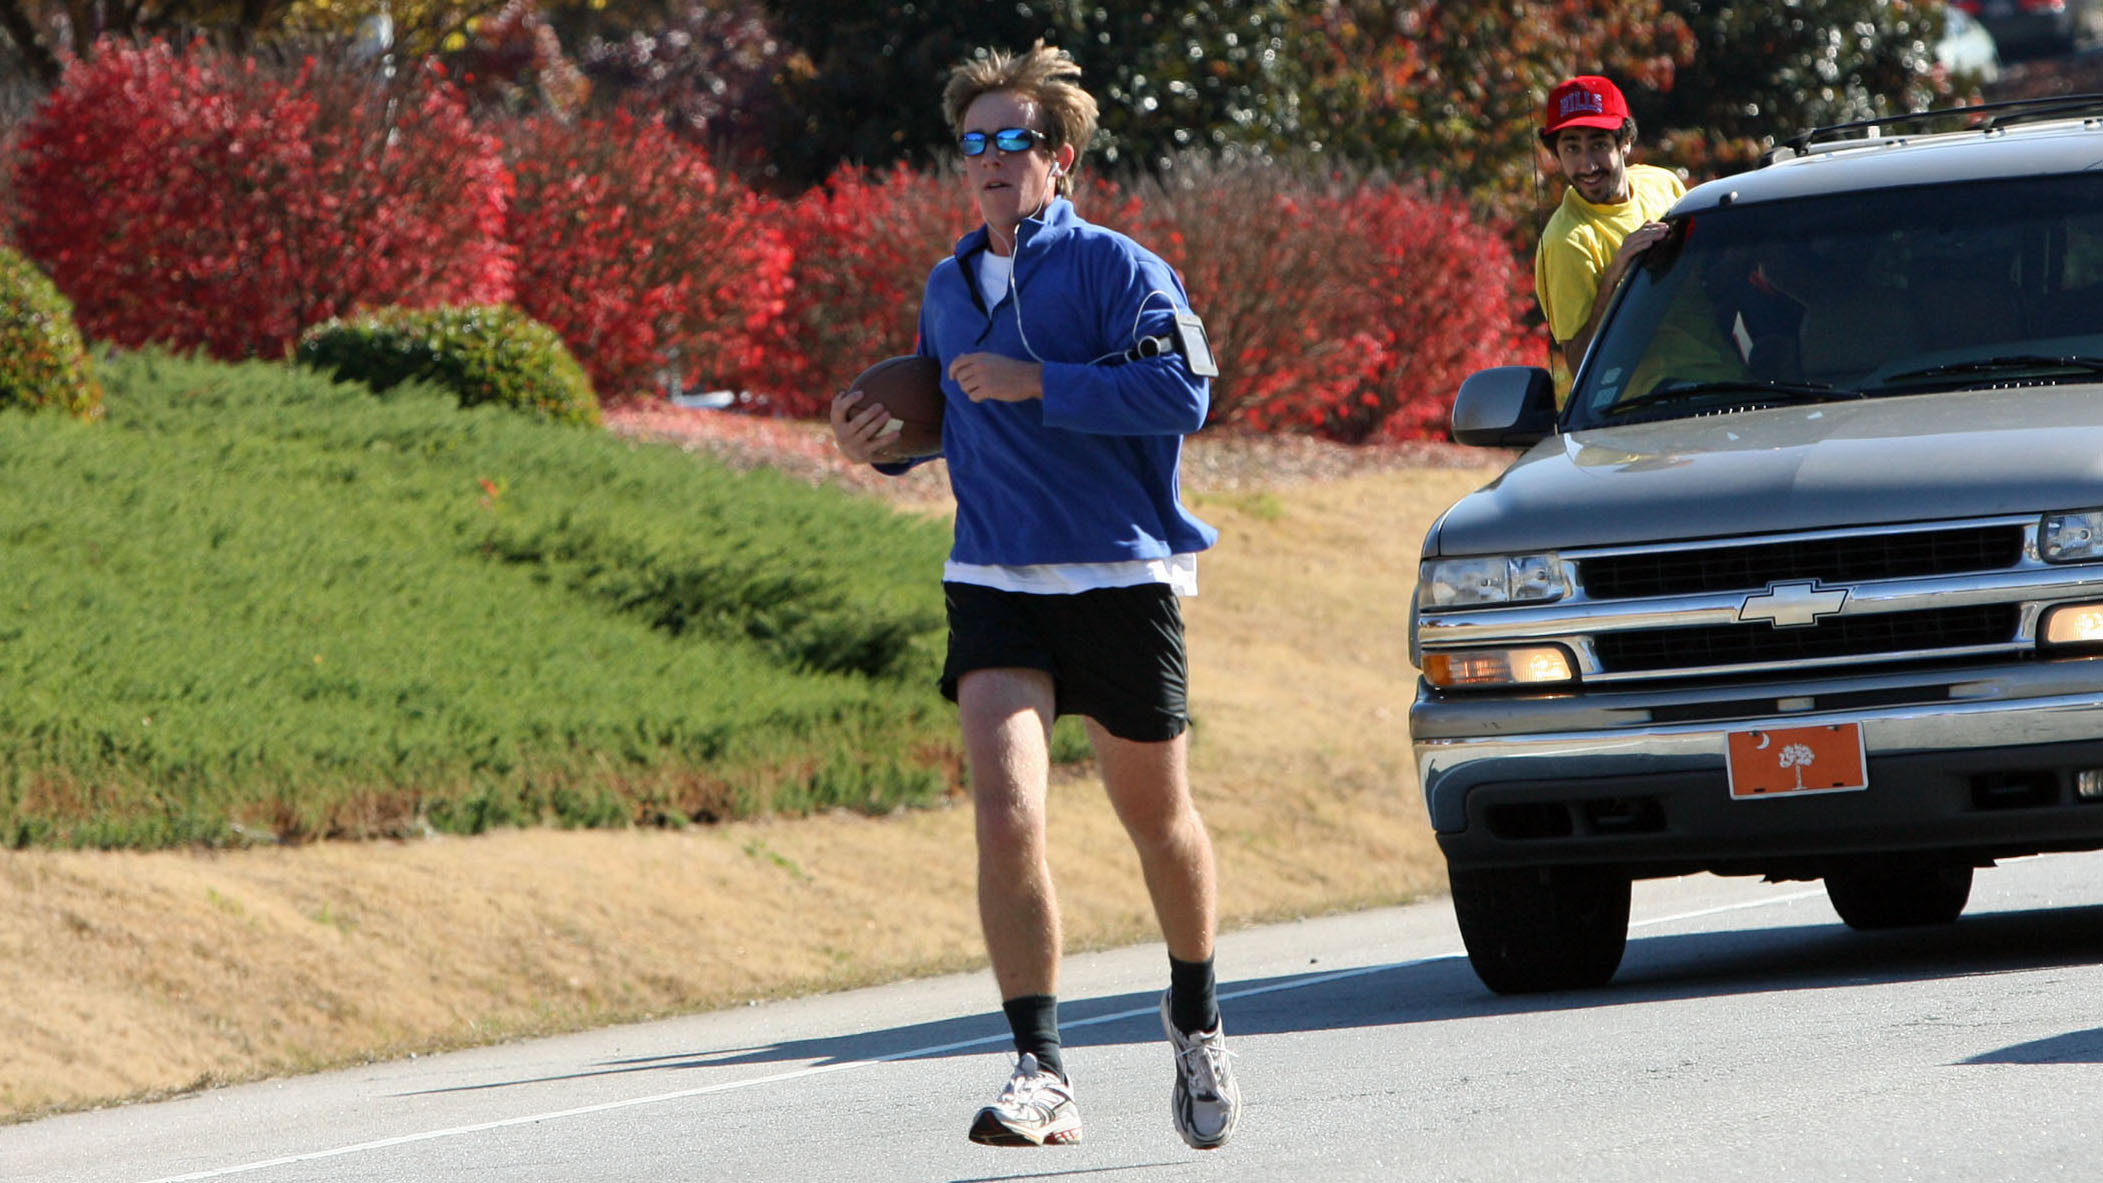 Annual Clemson-South Carolina Game Ball Run to be Held Nov. 21-22